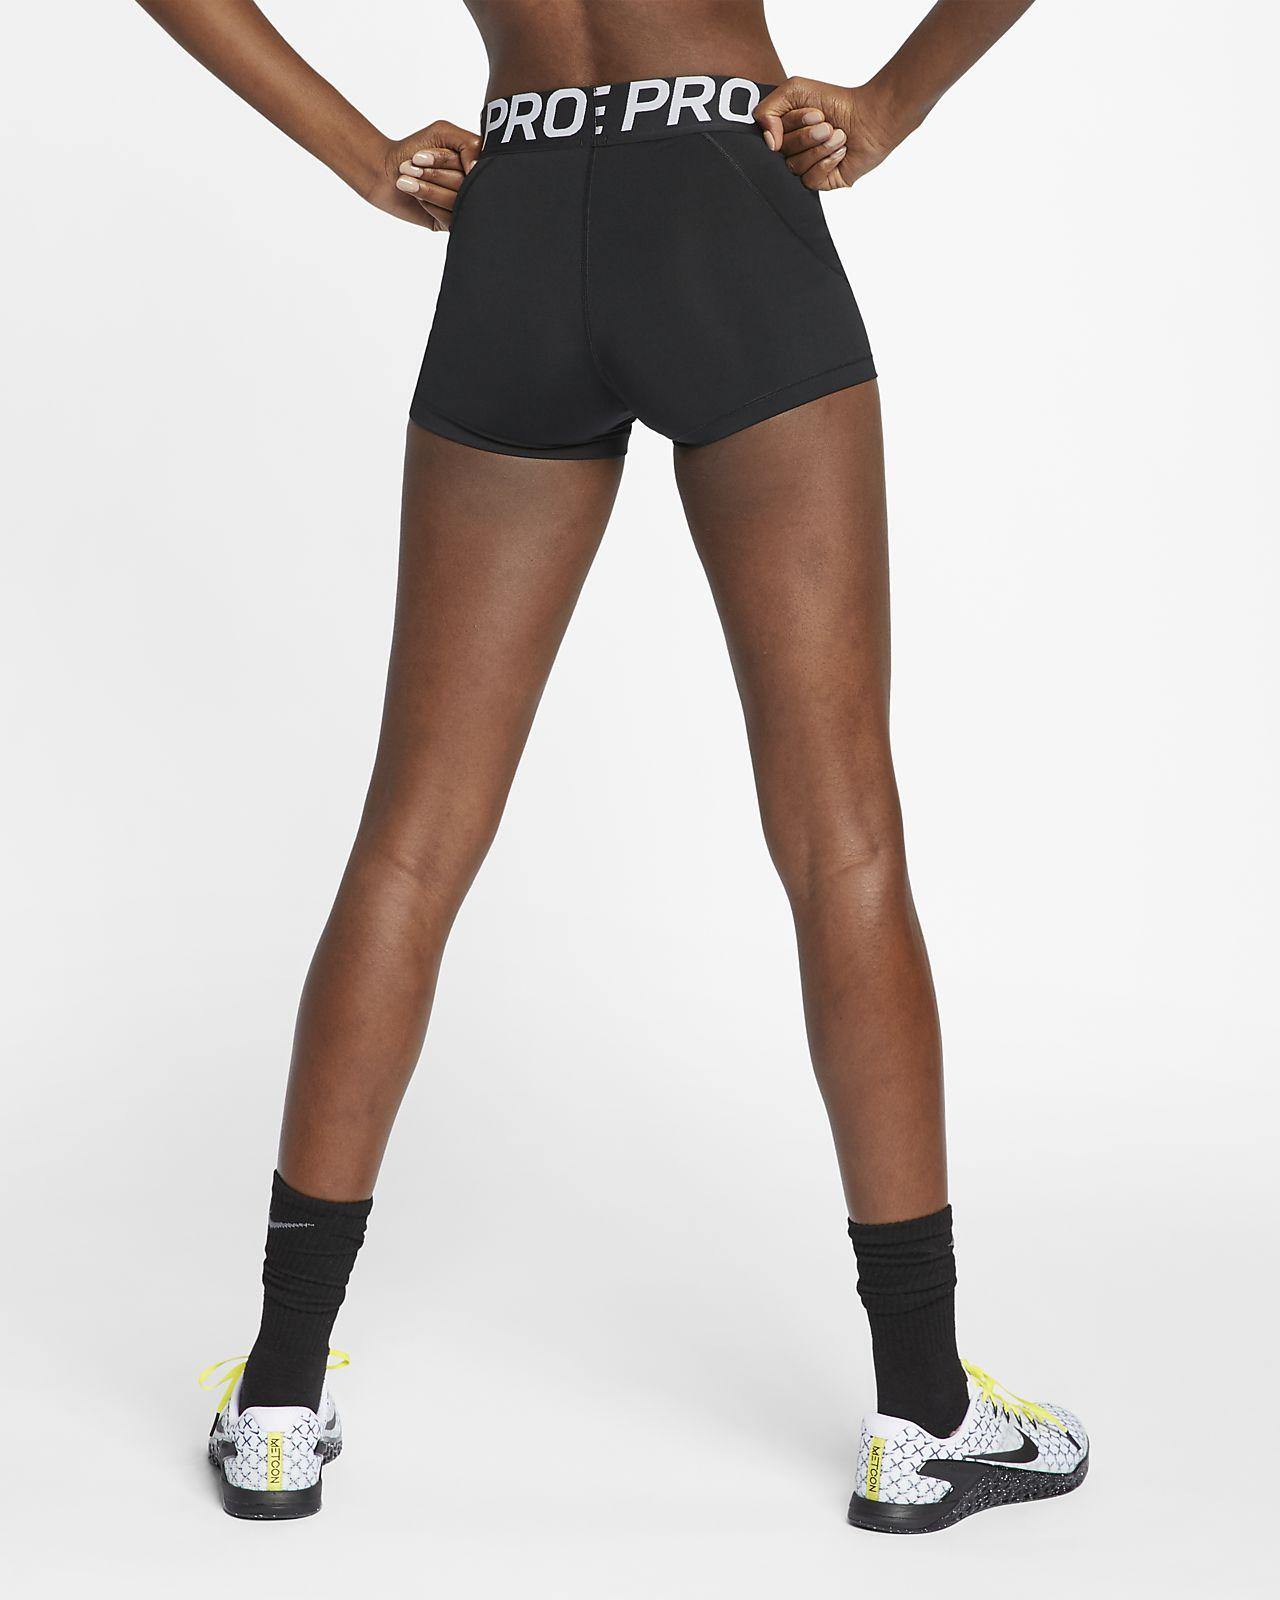 Bekleidung Damen Nike Damen Sport Fitness Trainings Freizeit Shorts Pro Tight Dri-FIT AO9977